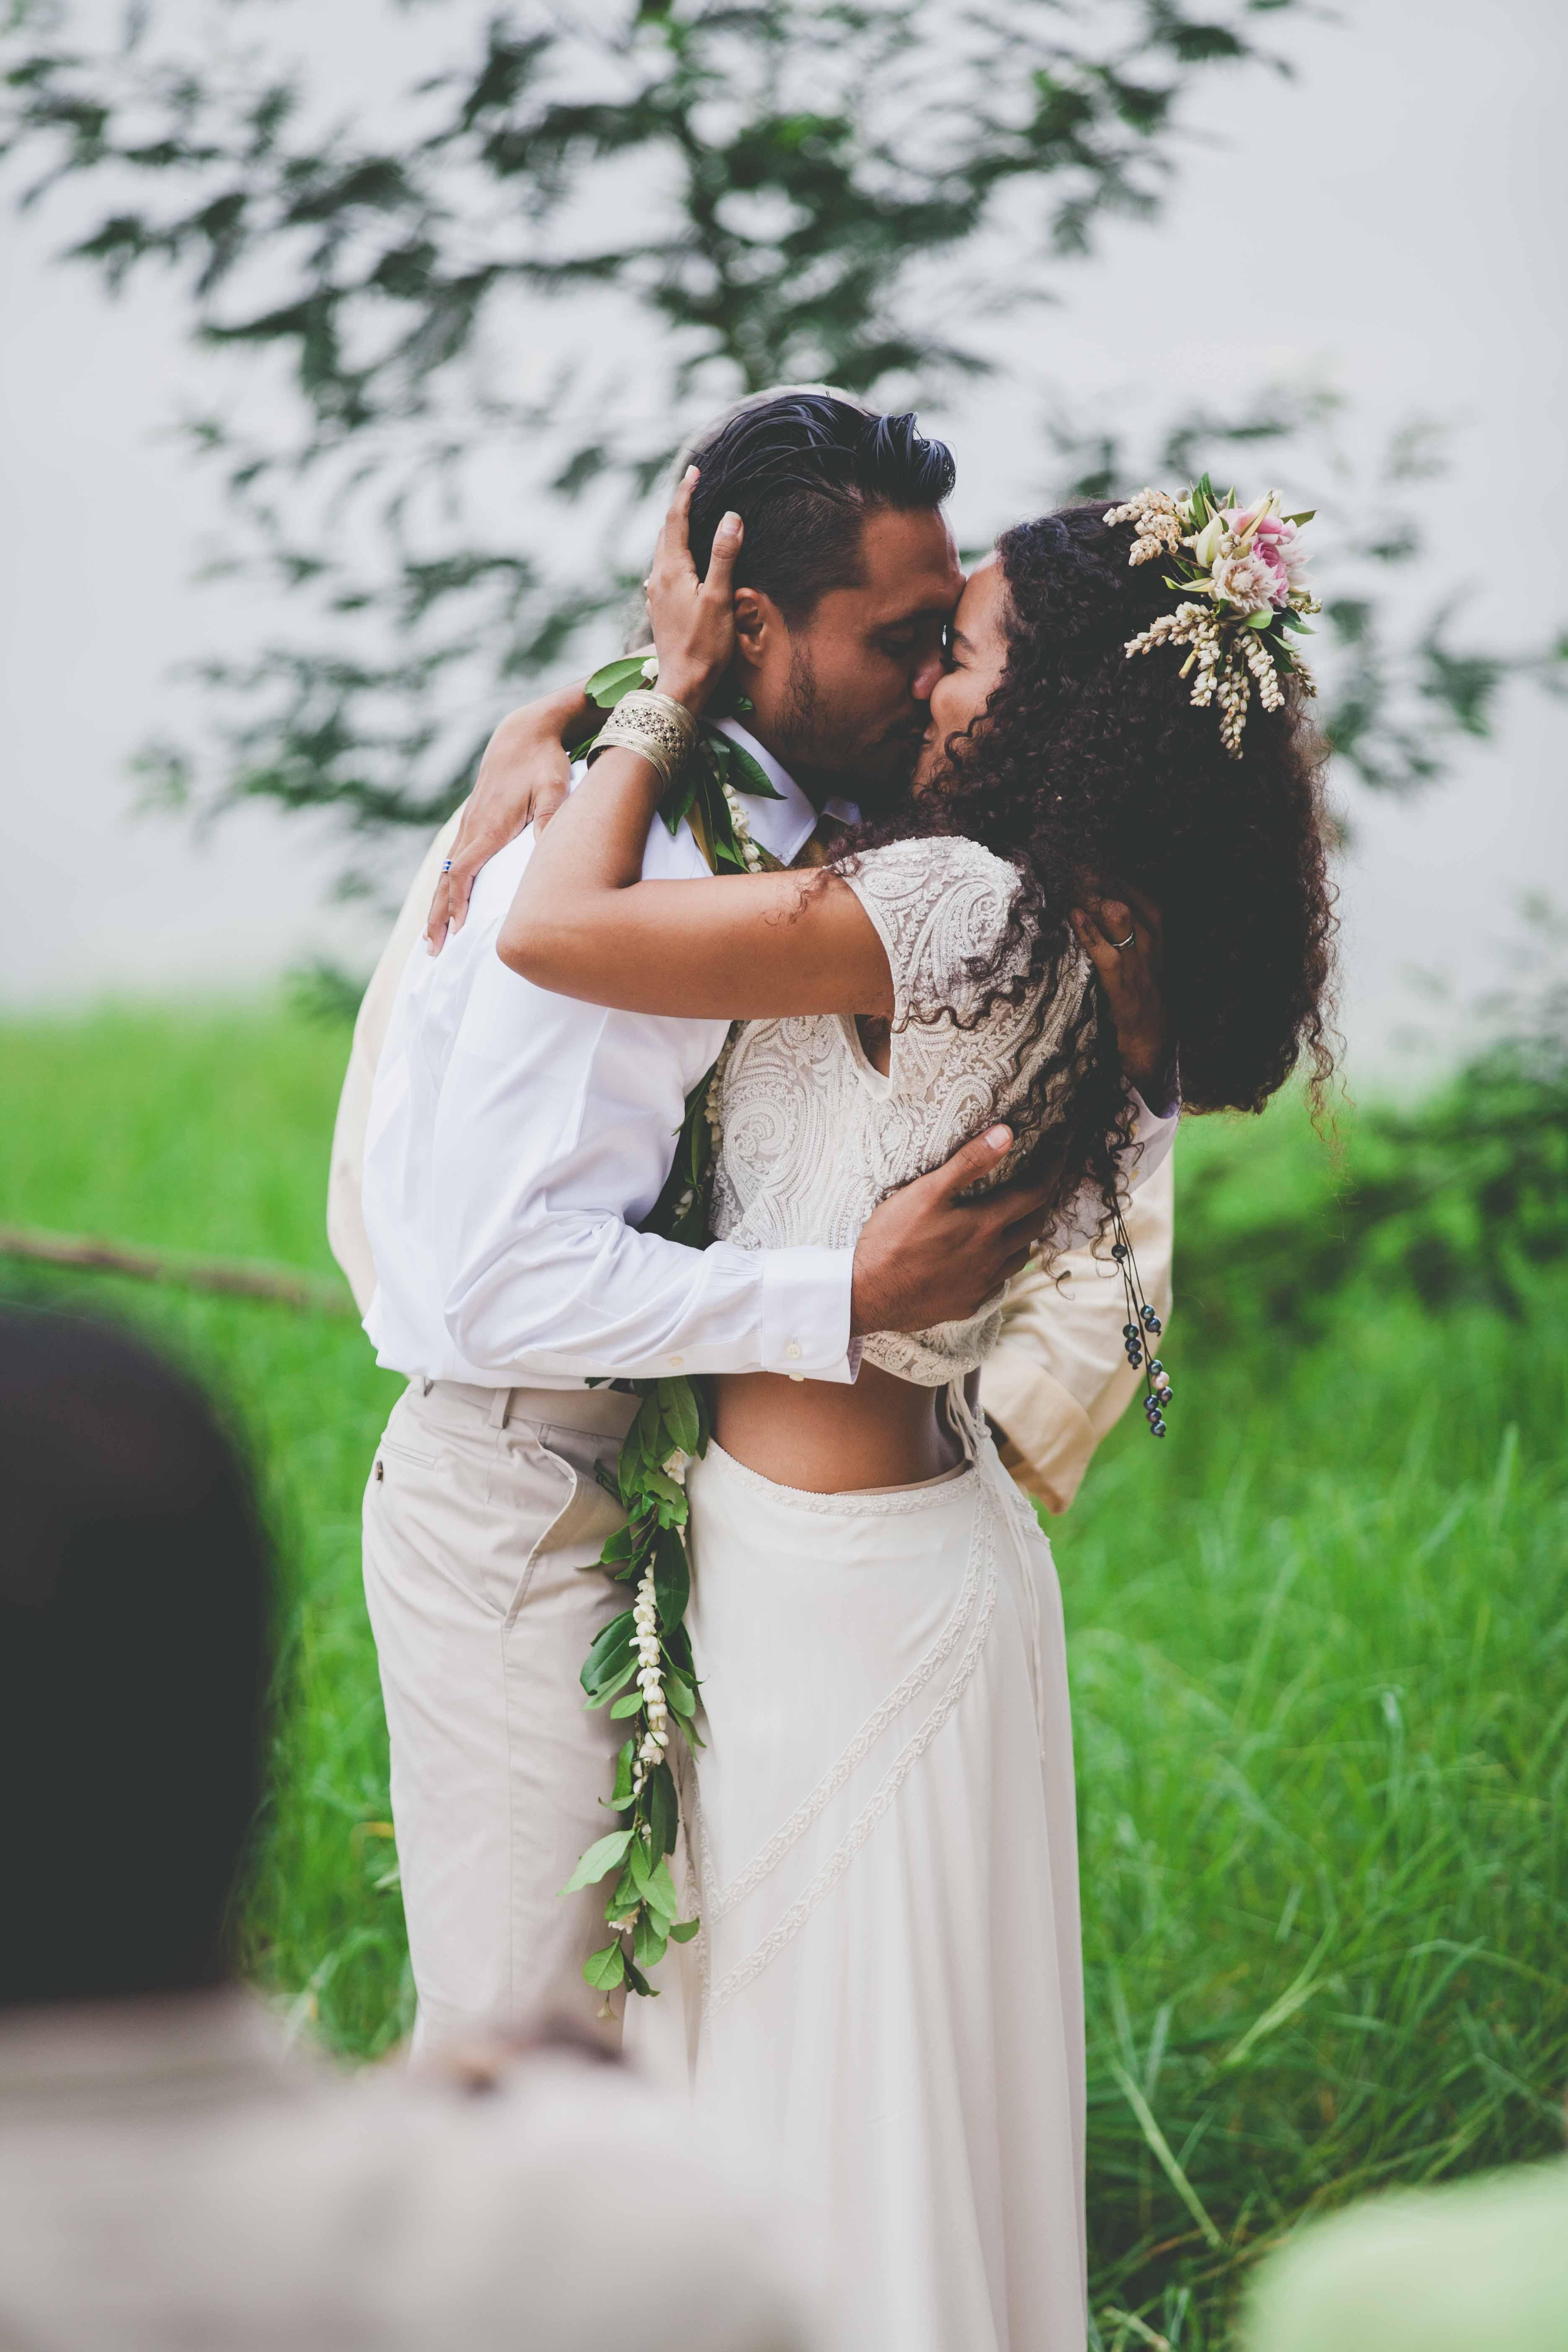 Traditional Wedding Gifts Hawaii : Traditional+Hawaiian+Wedding+Gift Stunning Traditional Hawaiian ...